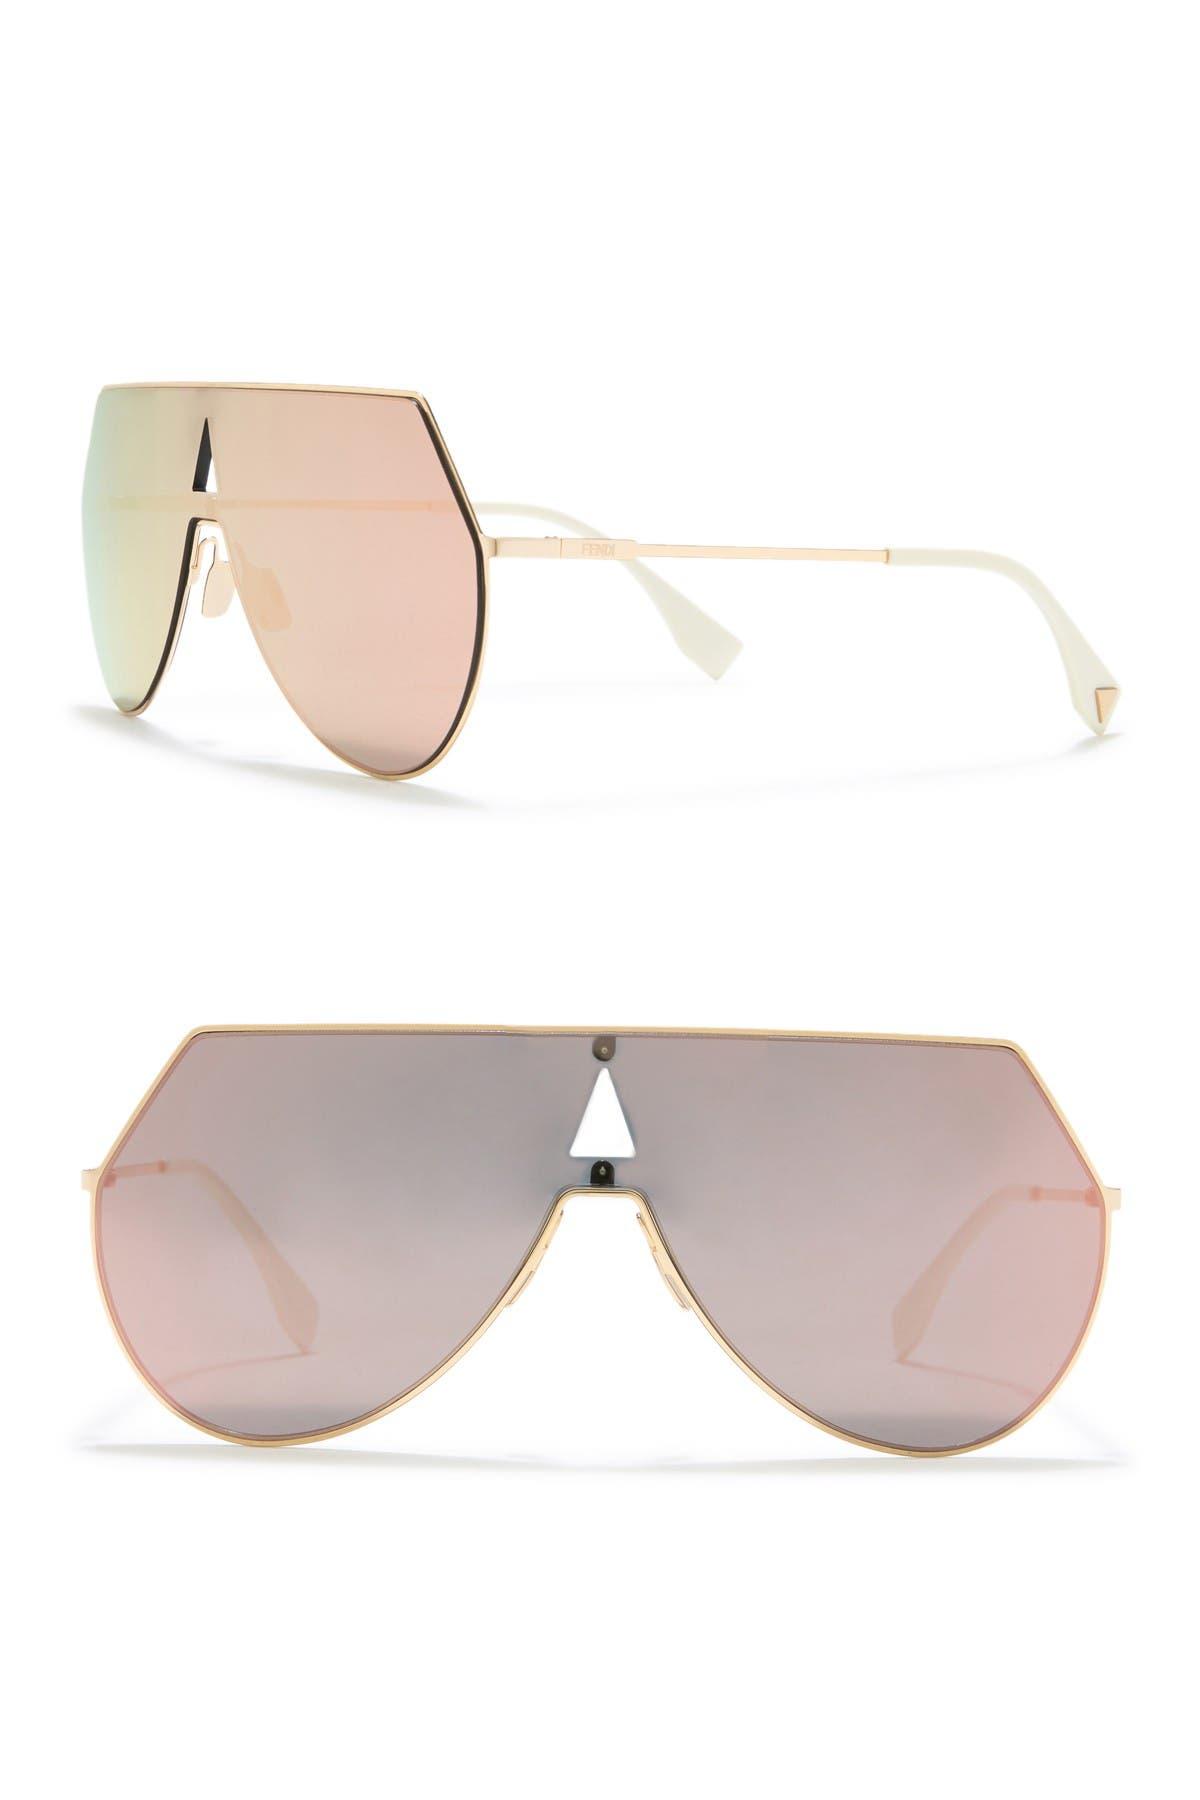 Image of FENDI 99mm Shield Aviator Sunglasses